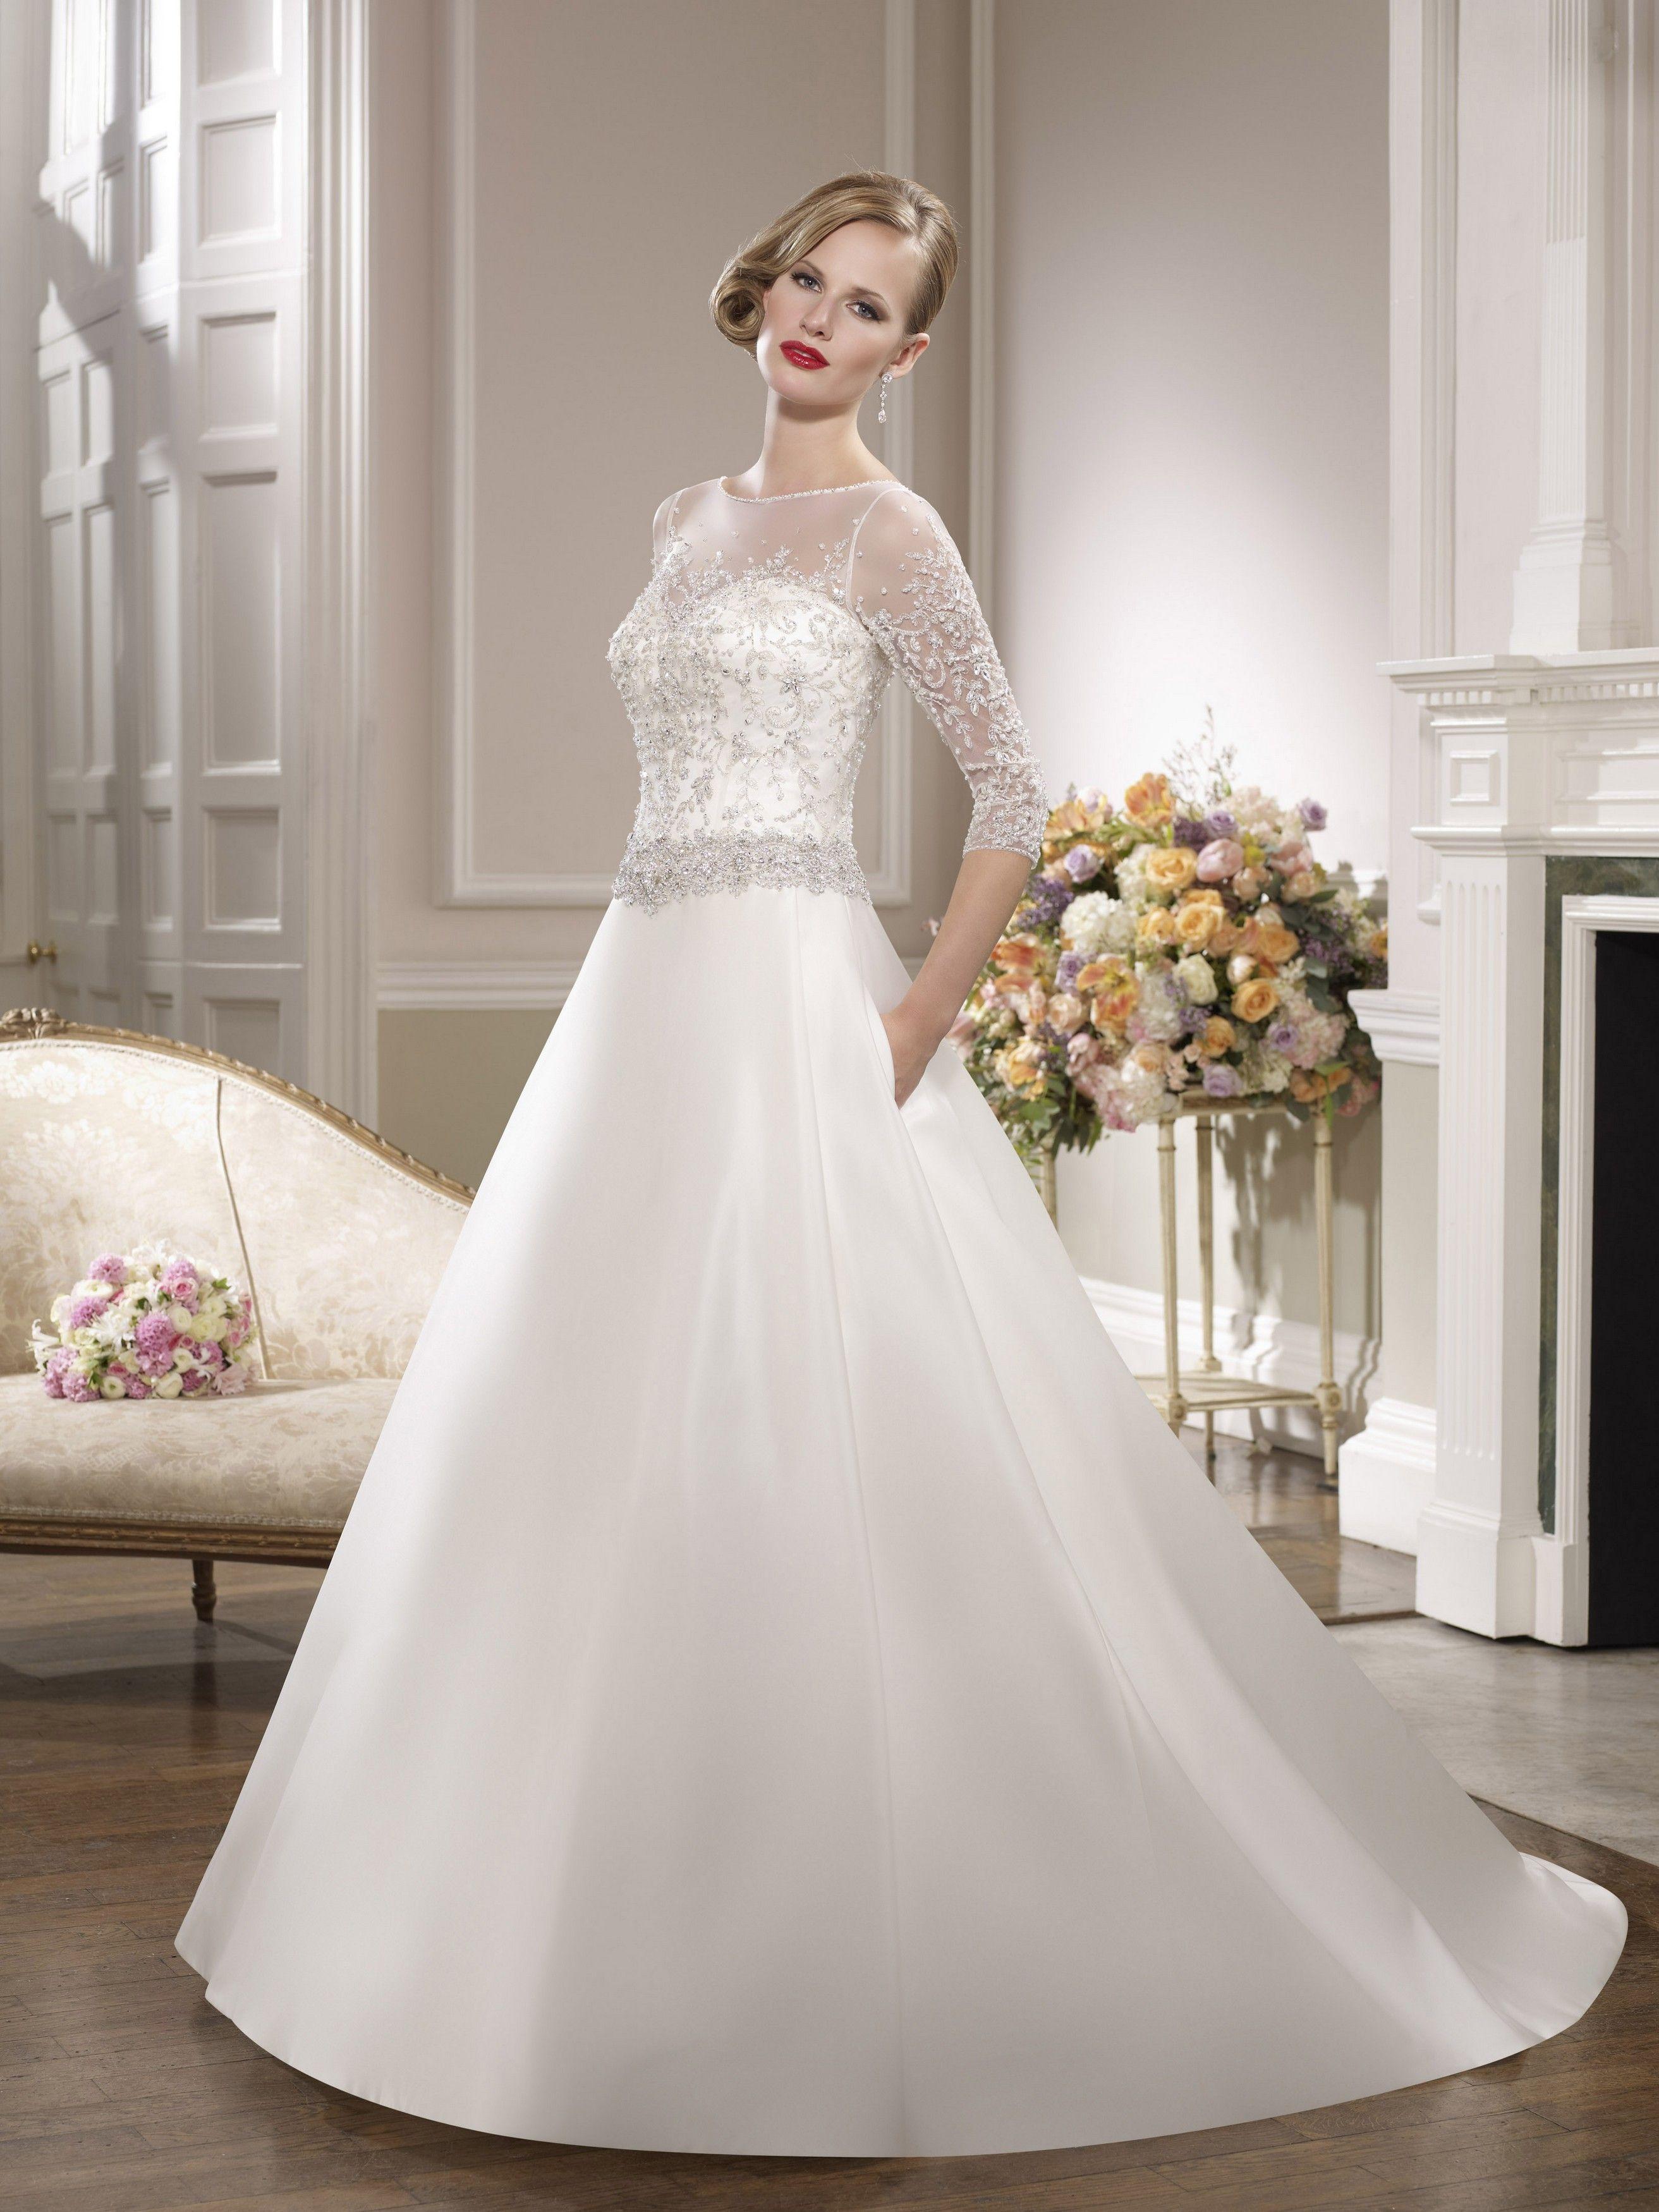 Pin by judy white on wedding ideas pinterest ronald joyce